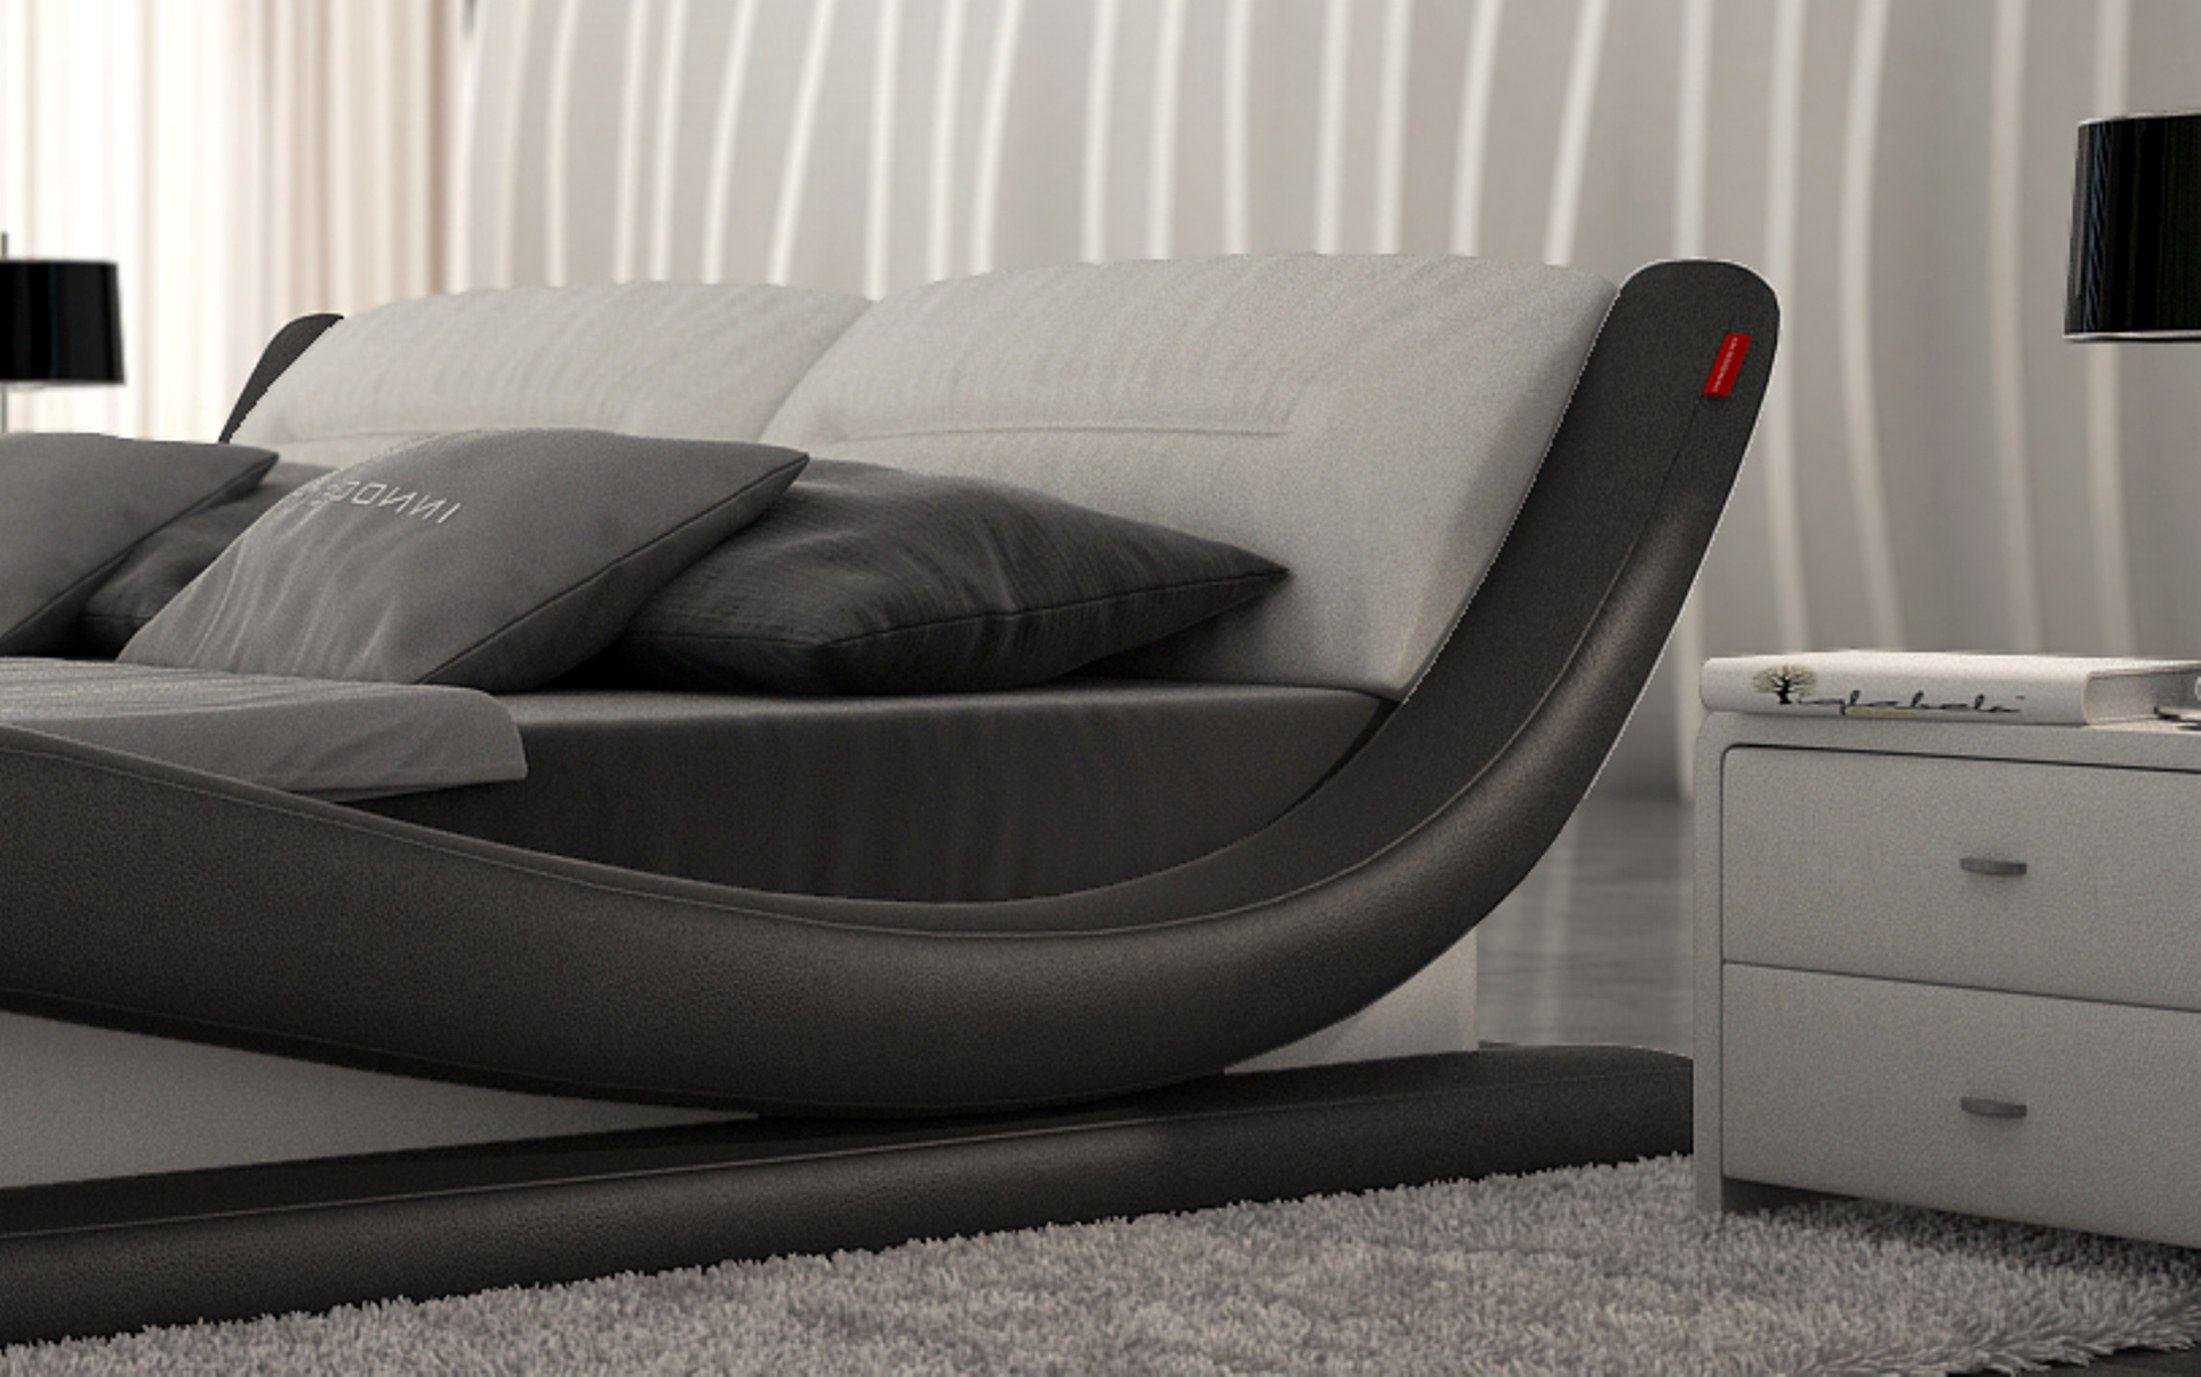 wasserbett aprilia komplettset luxus designerbett. Black Bedroom Furniture Sets. Home Design Ideas